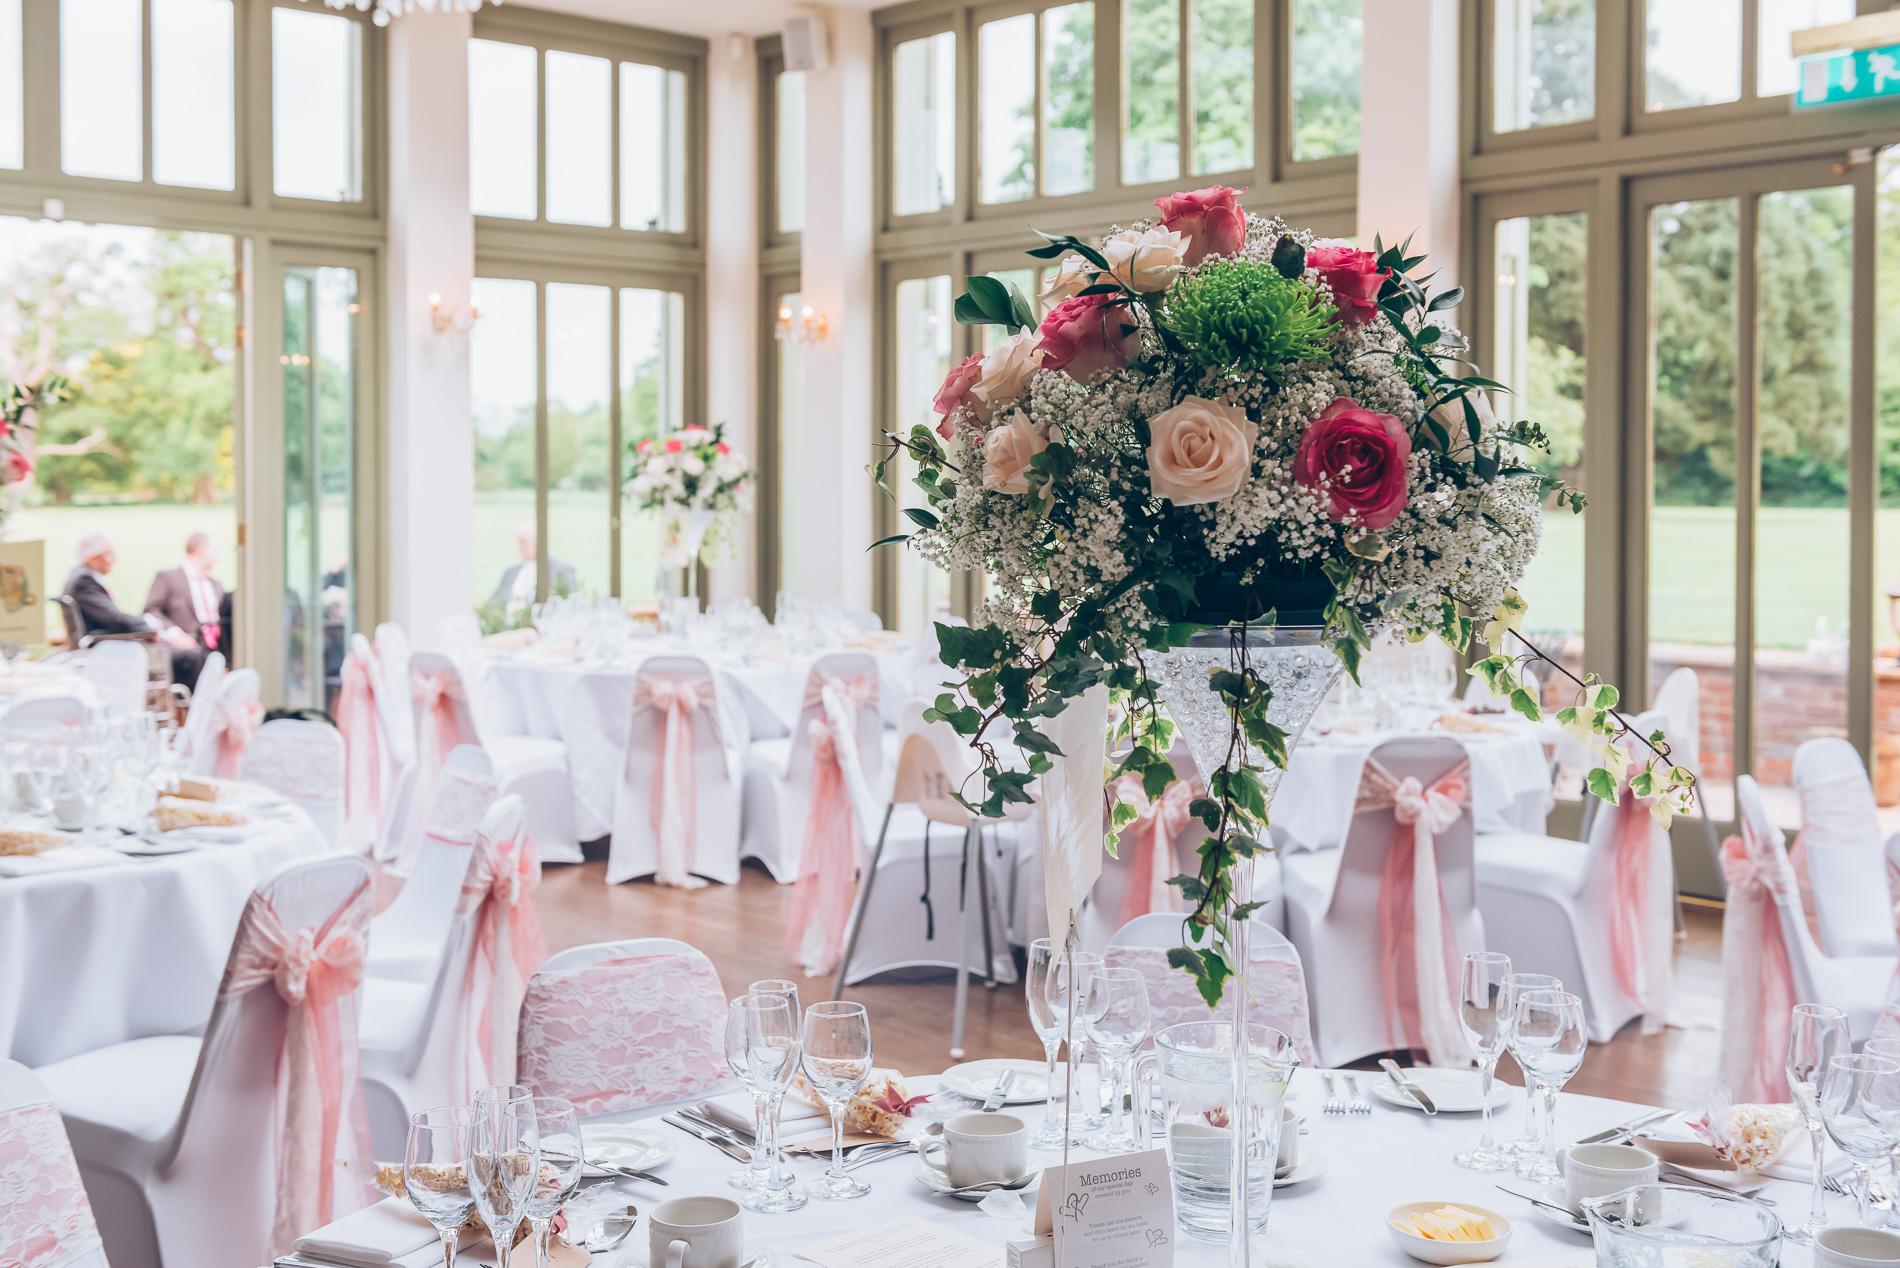 OFFLEY PLACE Wedding02